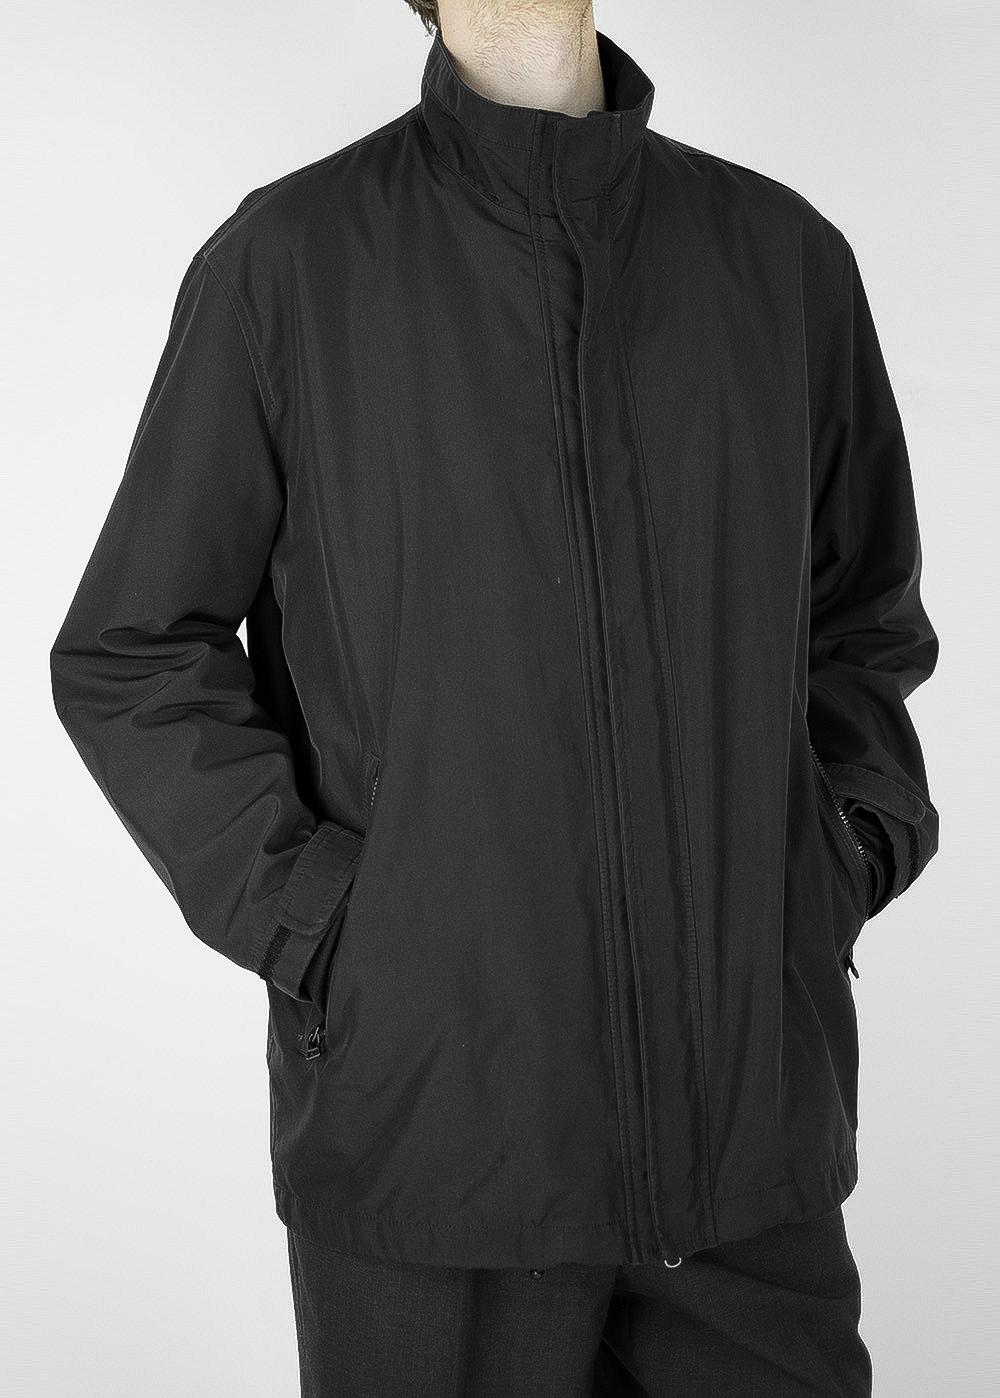 Black Jacket 13